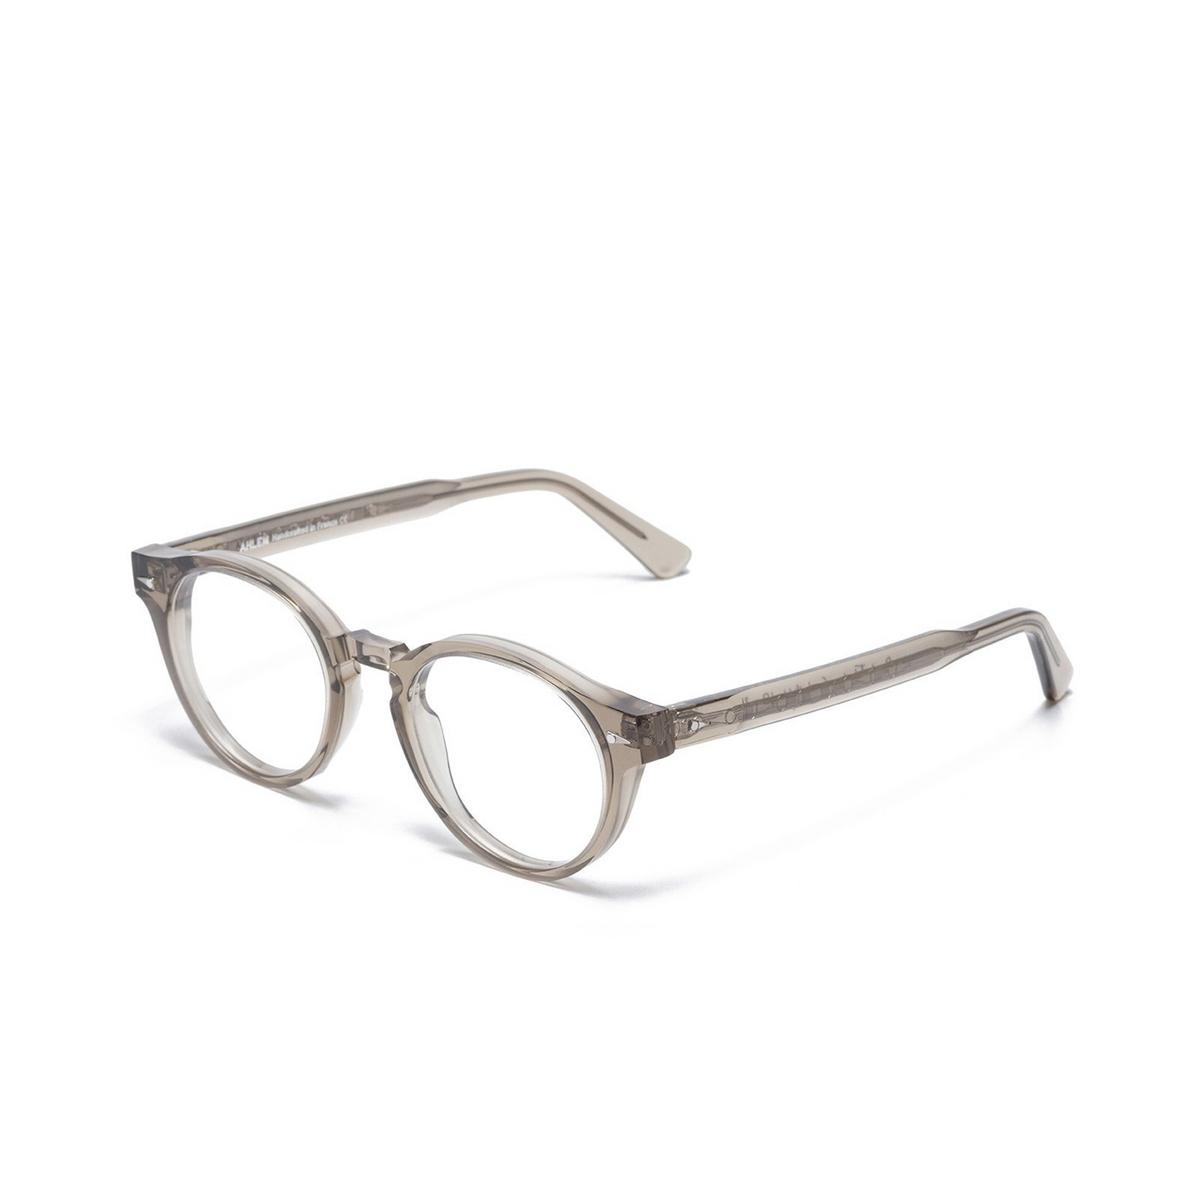 Ahlem® Round Eyeglasses: Rue Du Theatre color Smokedlight.